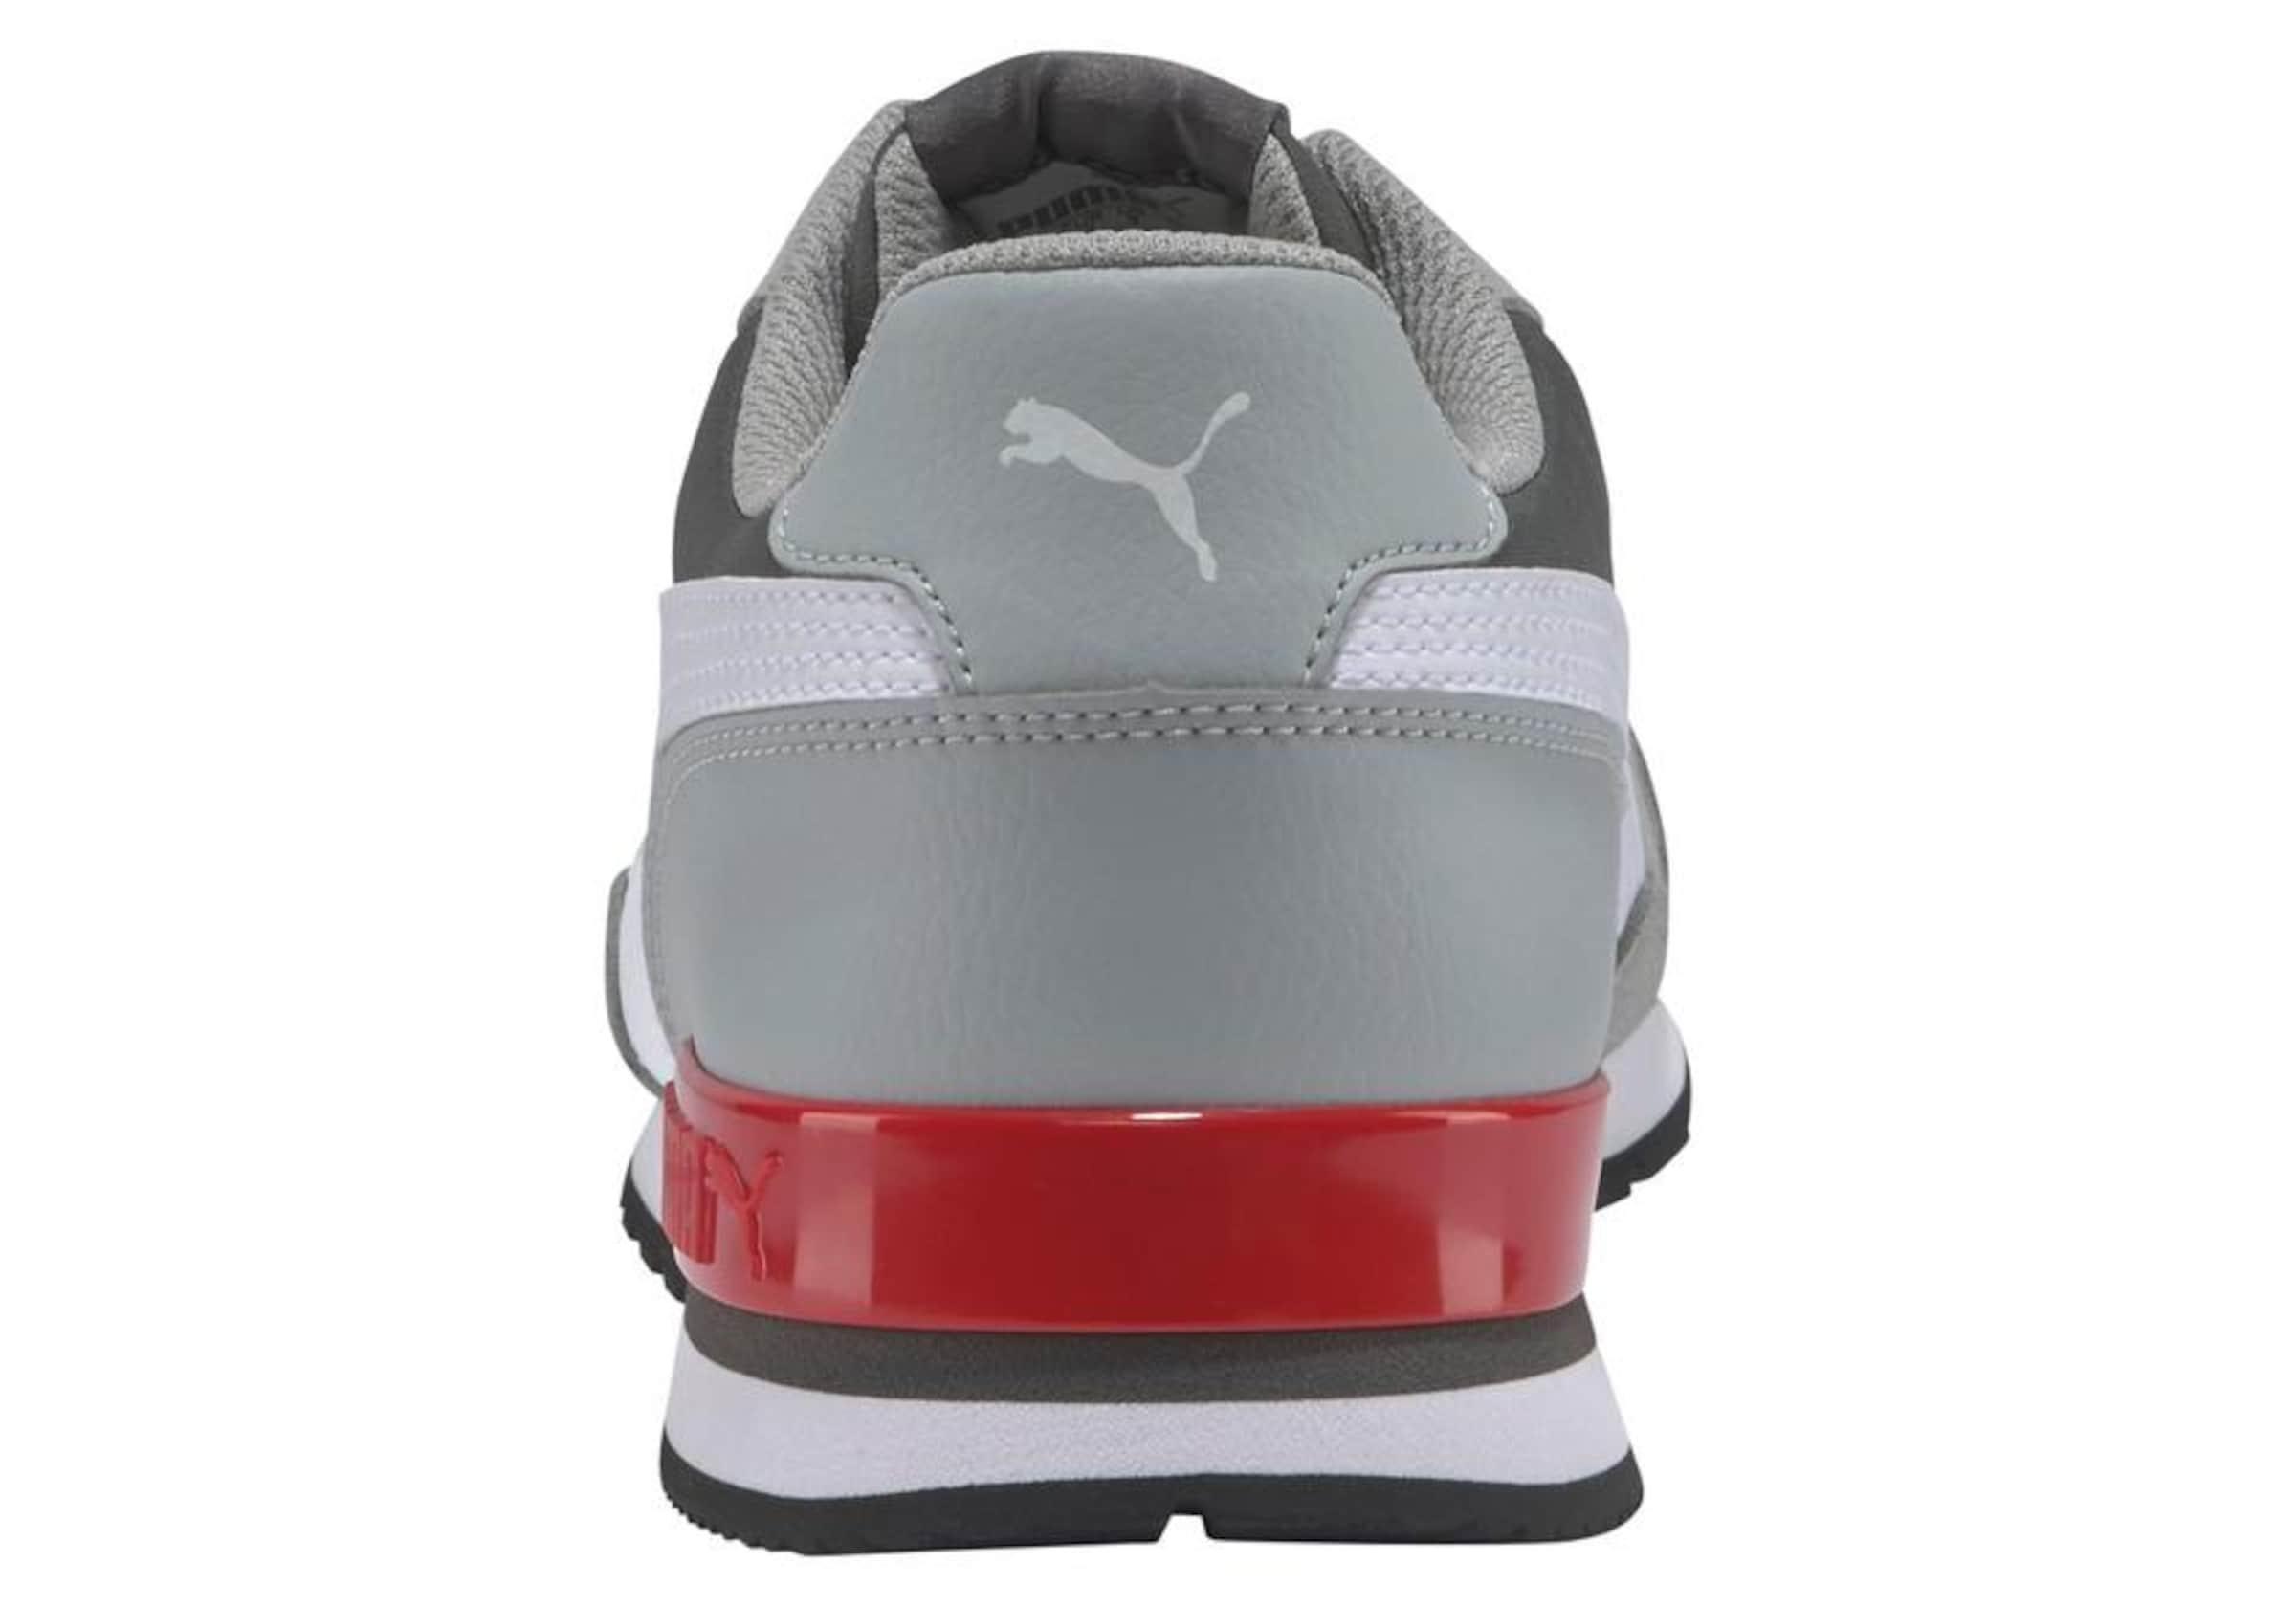 Sneaker In Puma Nl' 'st Weiß Runner V2 GrauBasaltgrau fv76bgyY